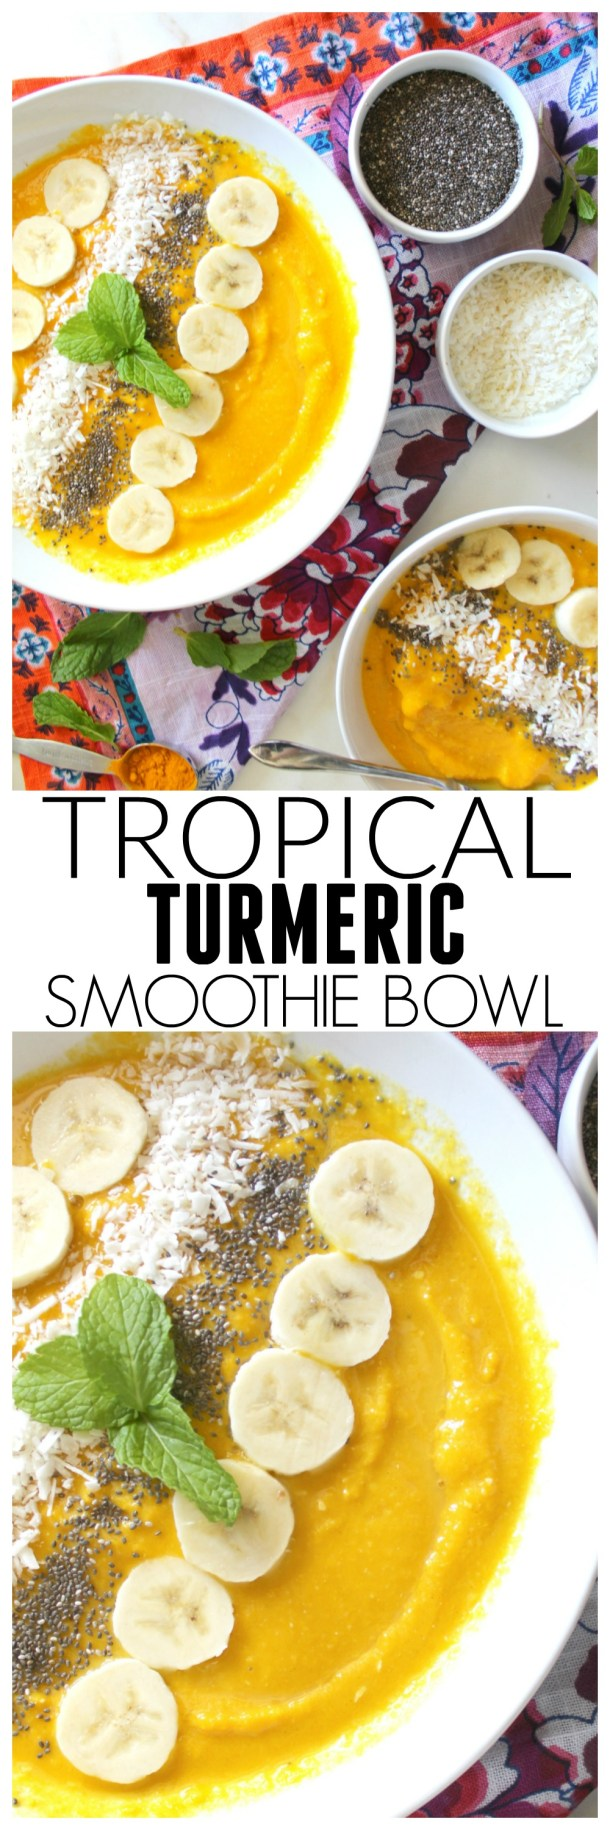 Tropical Turmeric Smoothie Bowl | ThisSavoryVegan.com